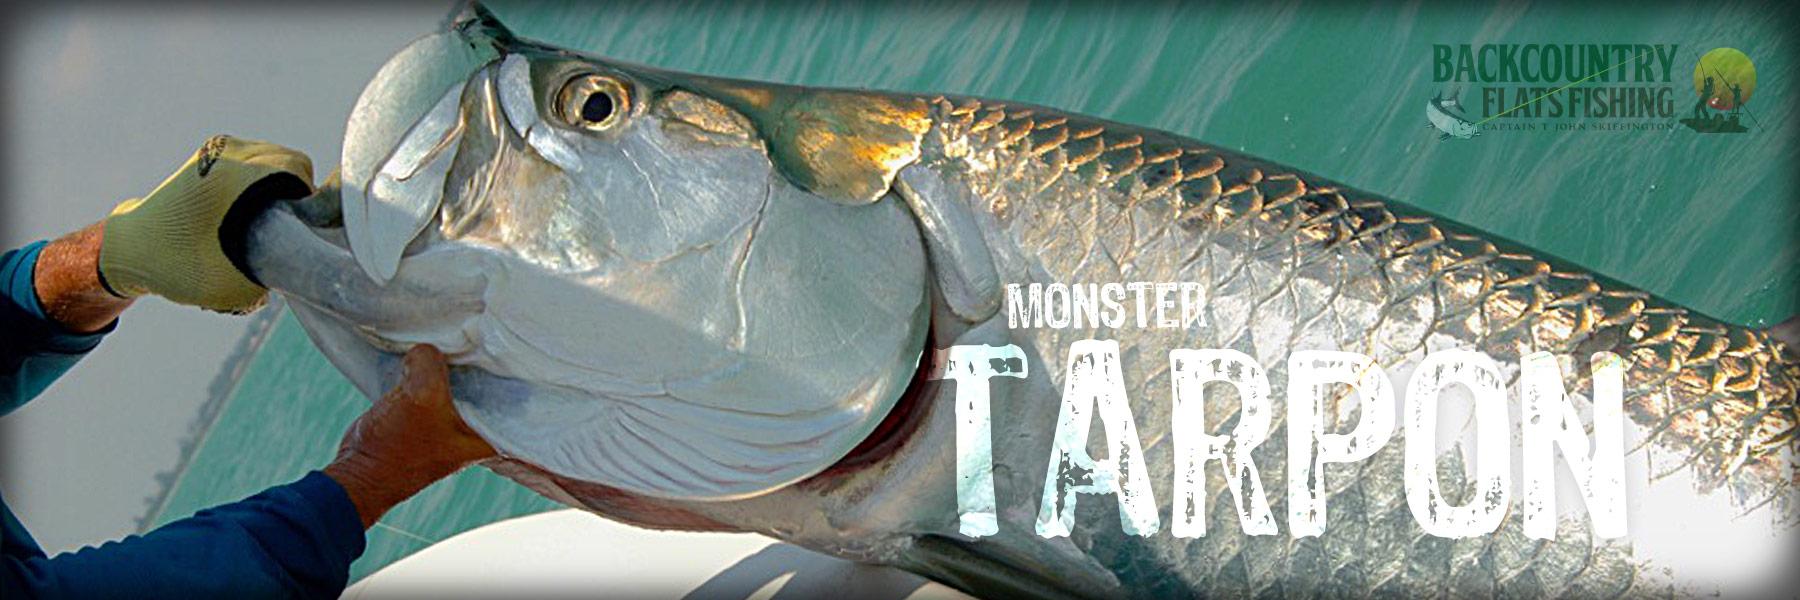 Monster Tarpon Fishing Everglades